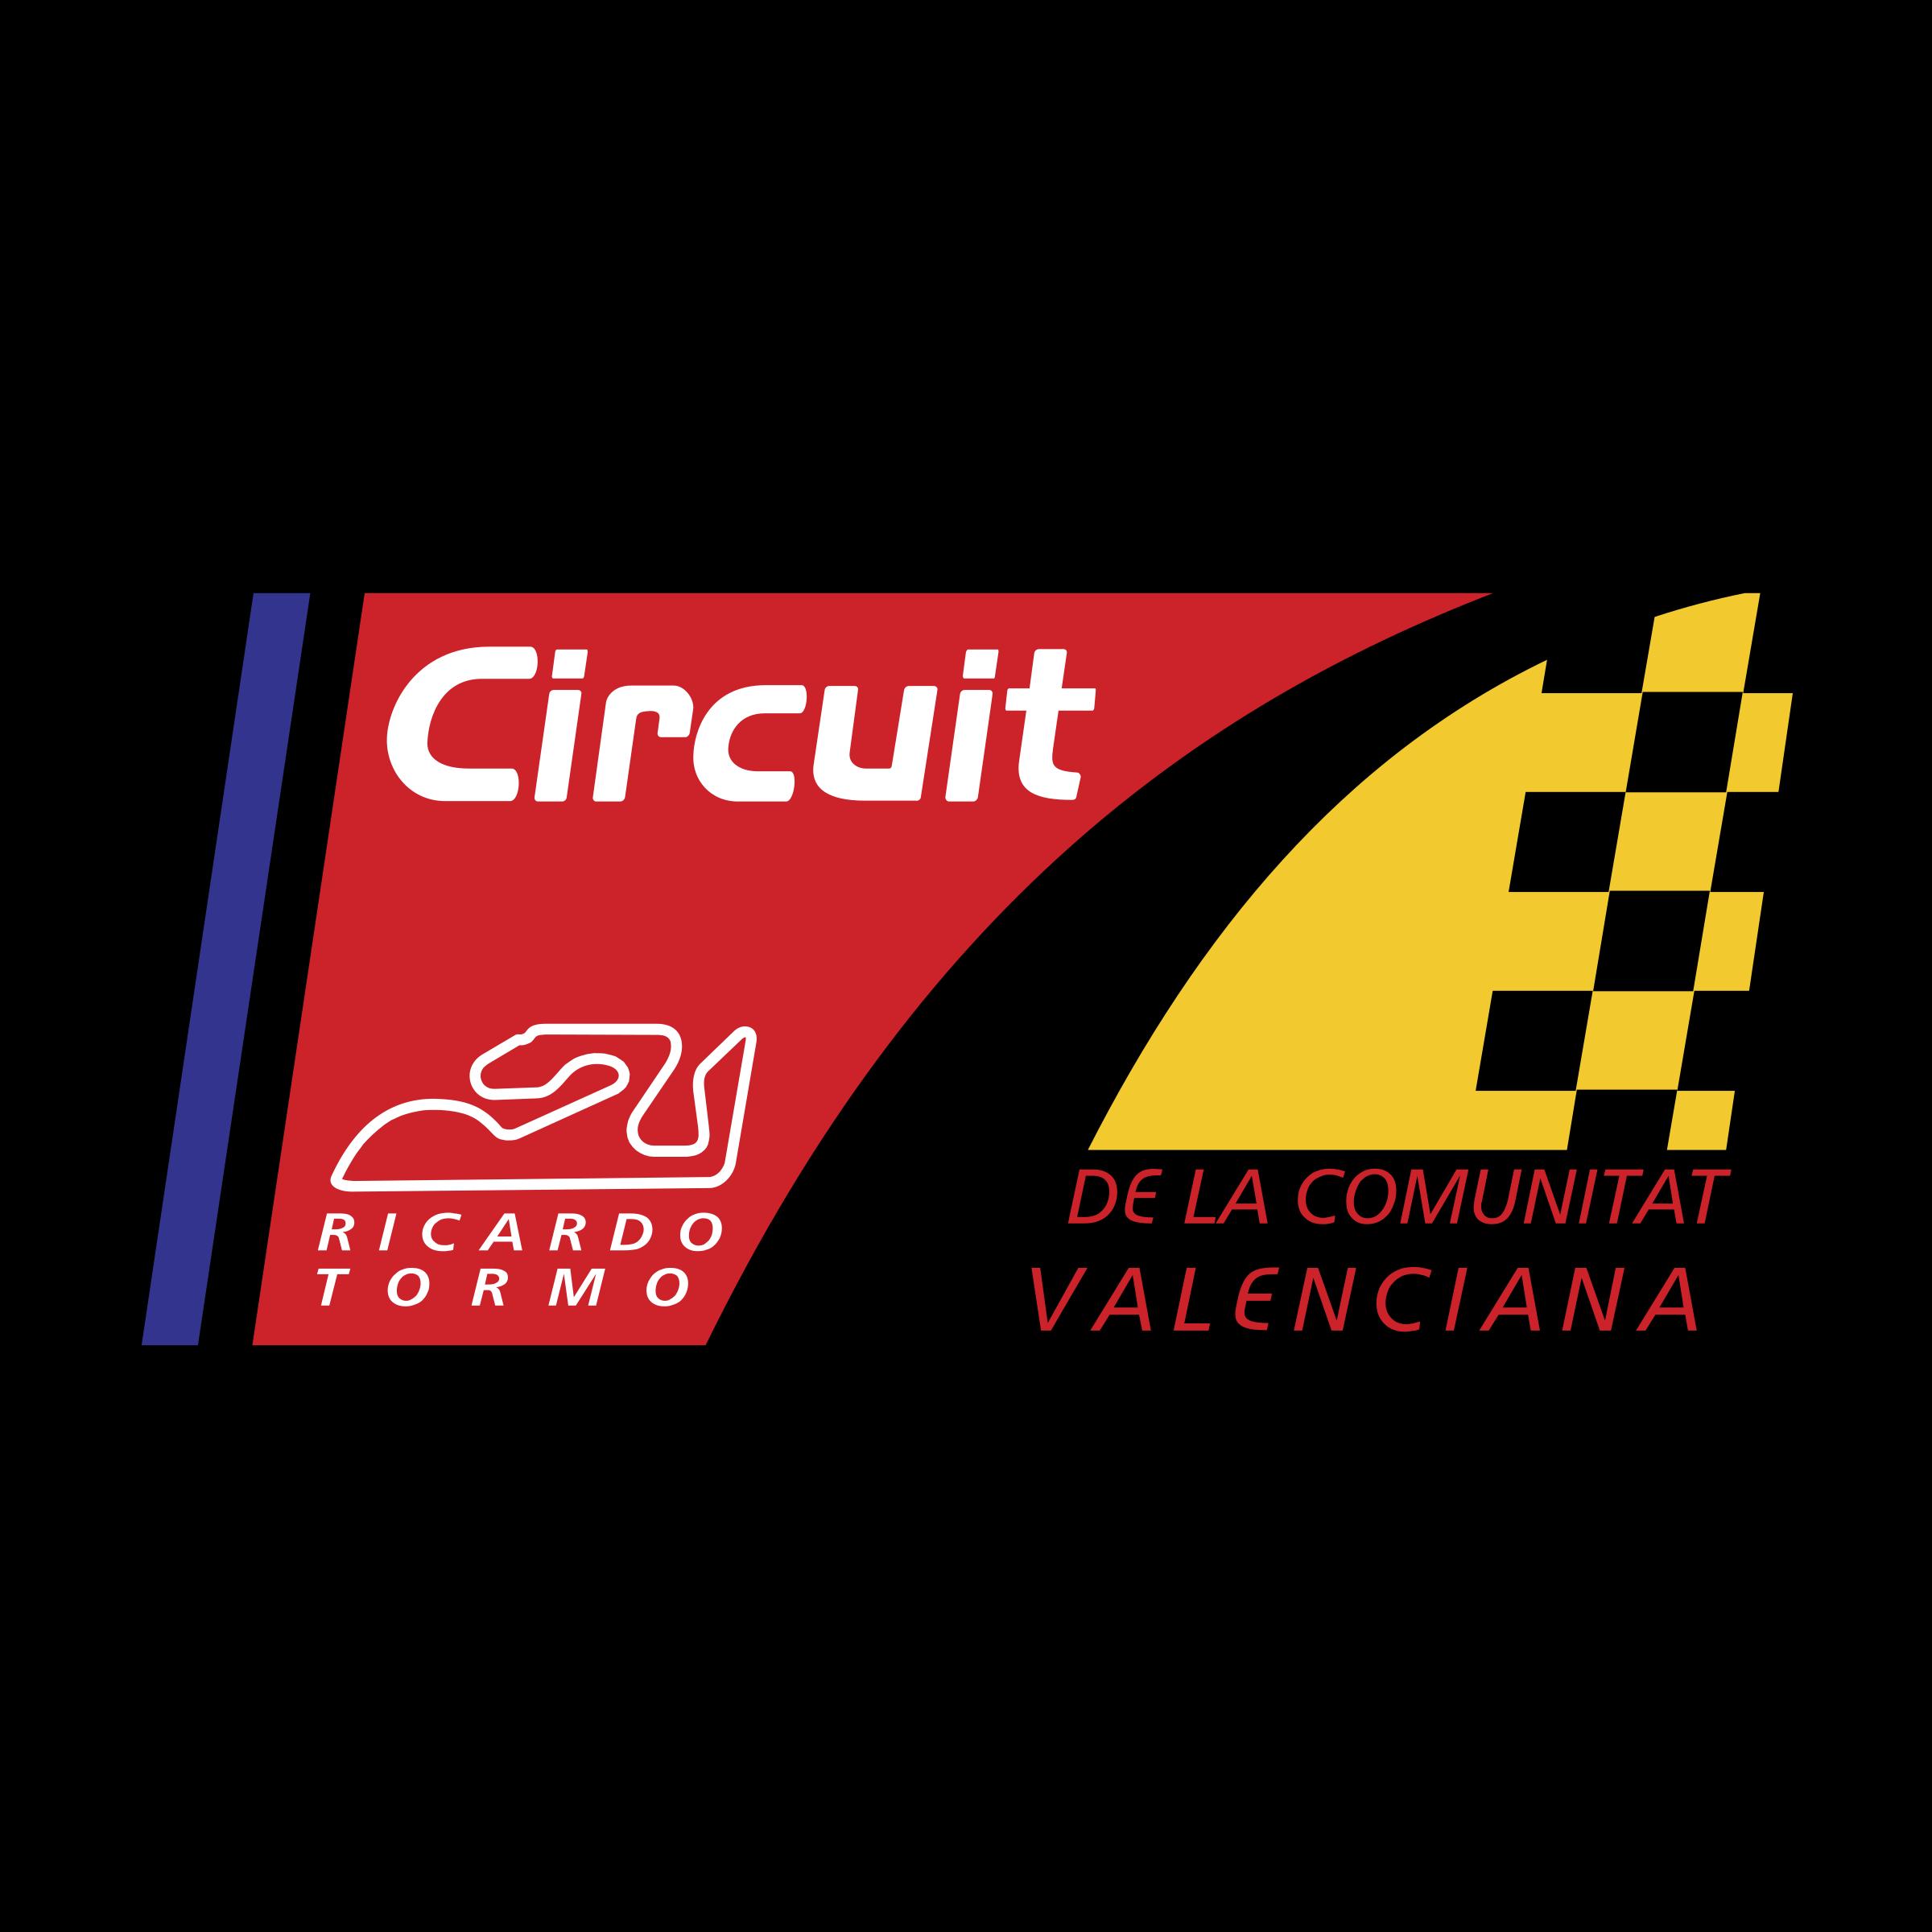 Circuit Logo PNG Transparent & SVG Vector - Freebie Supply